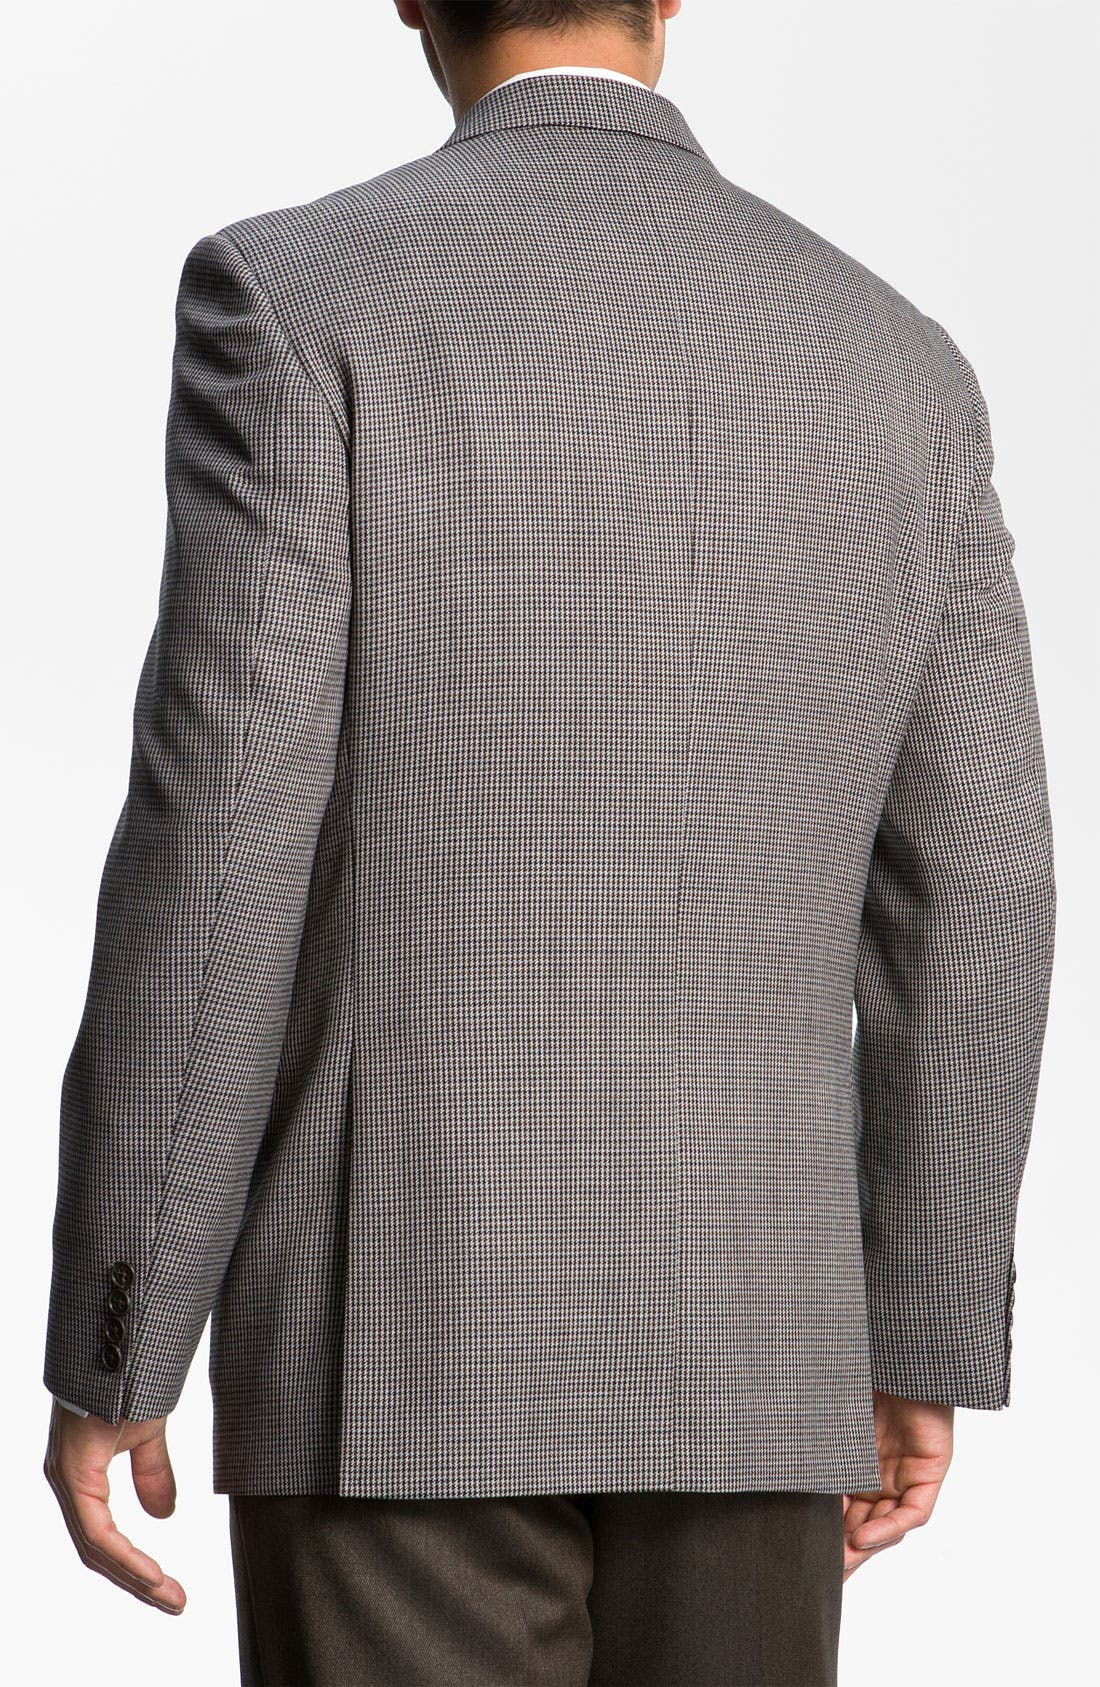 Alternate Image 2  - Joseph Abboud Houndstooth Sportcoat